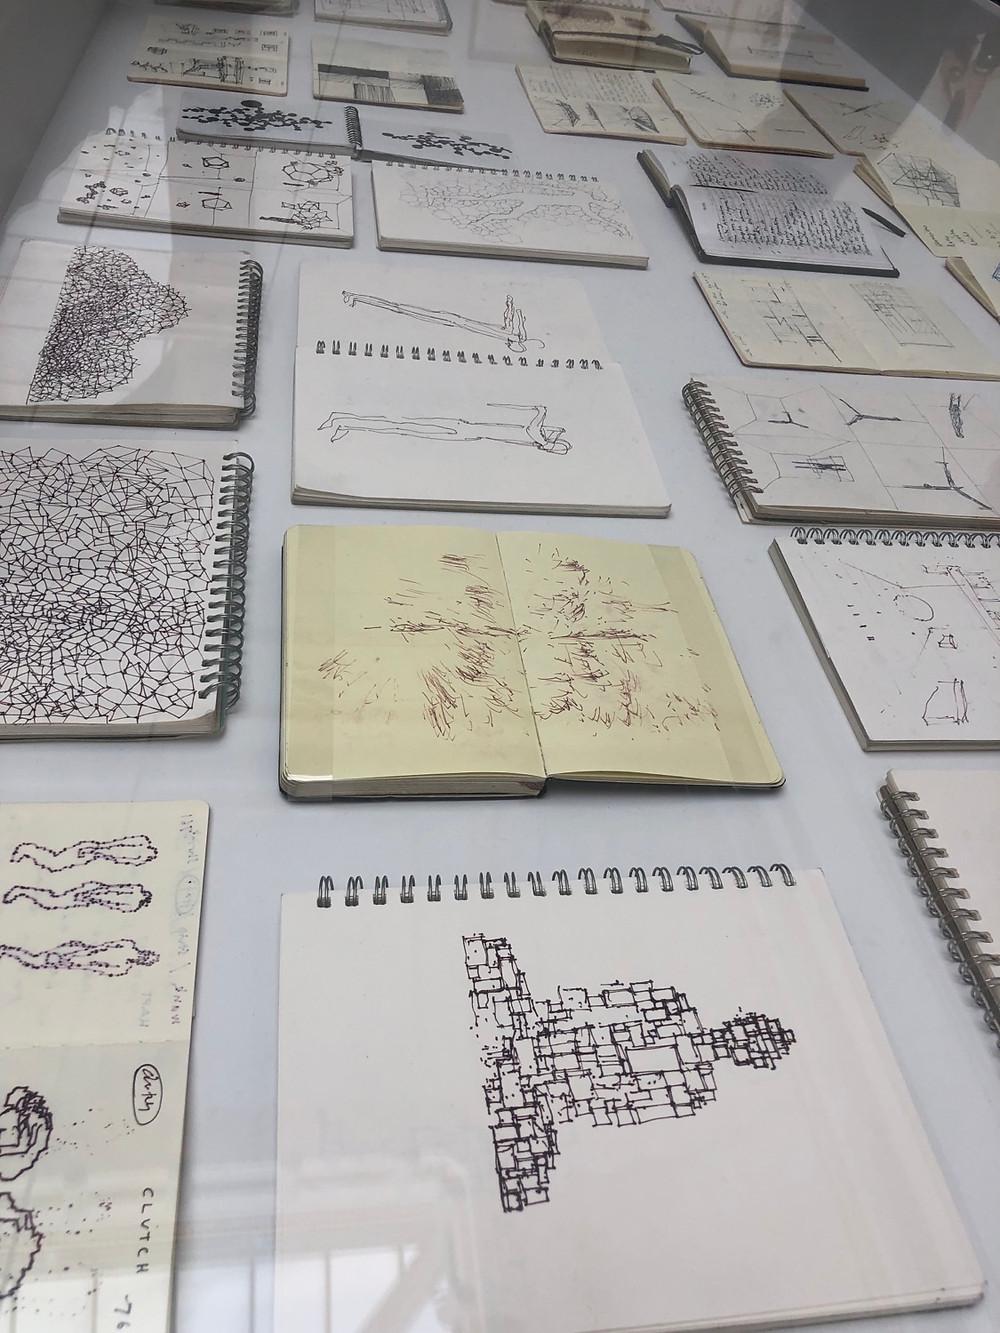 Antony Gormley's notebooks